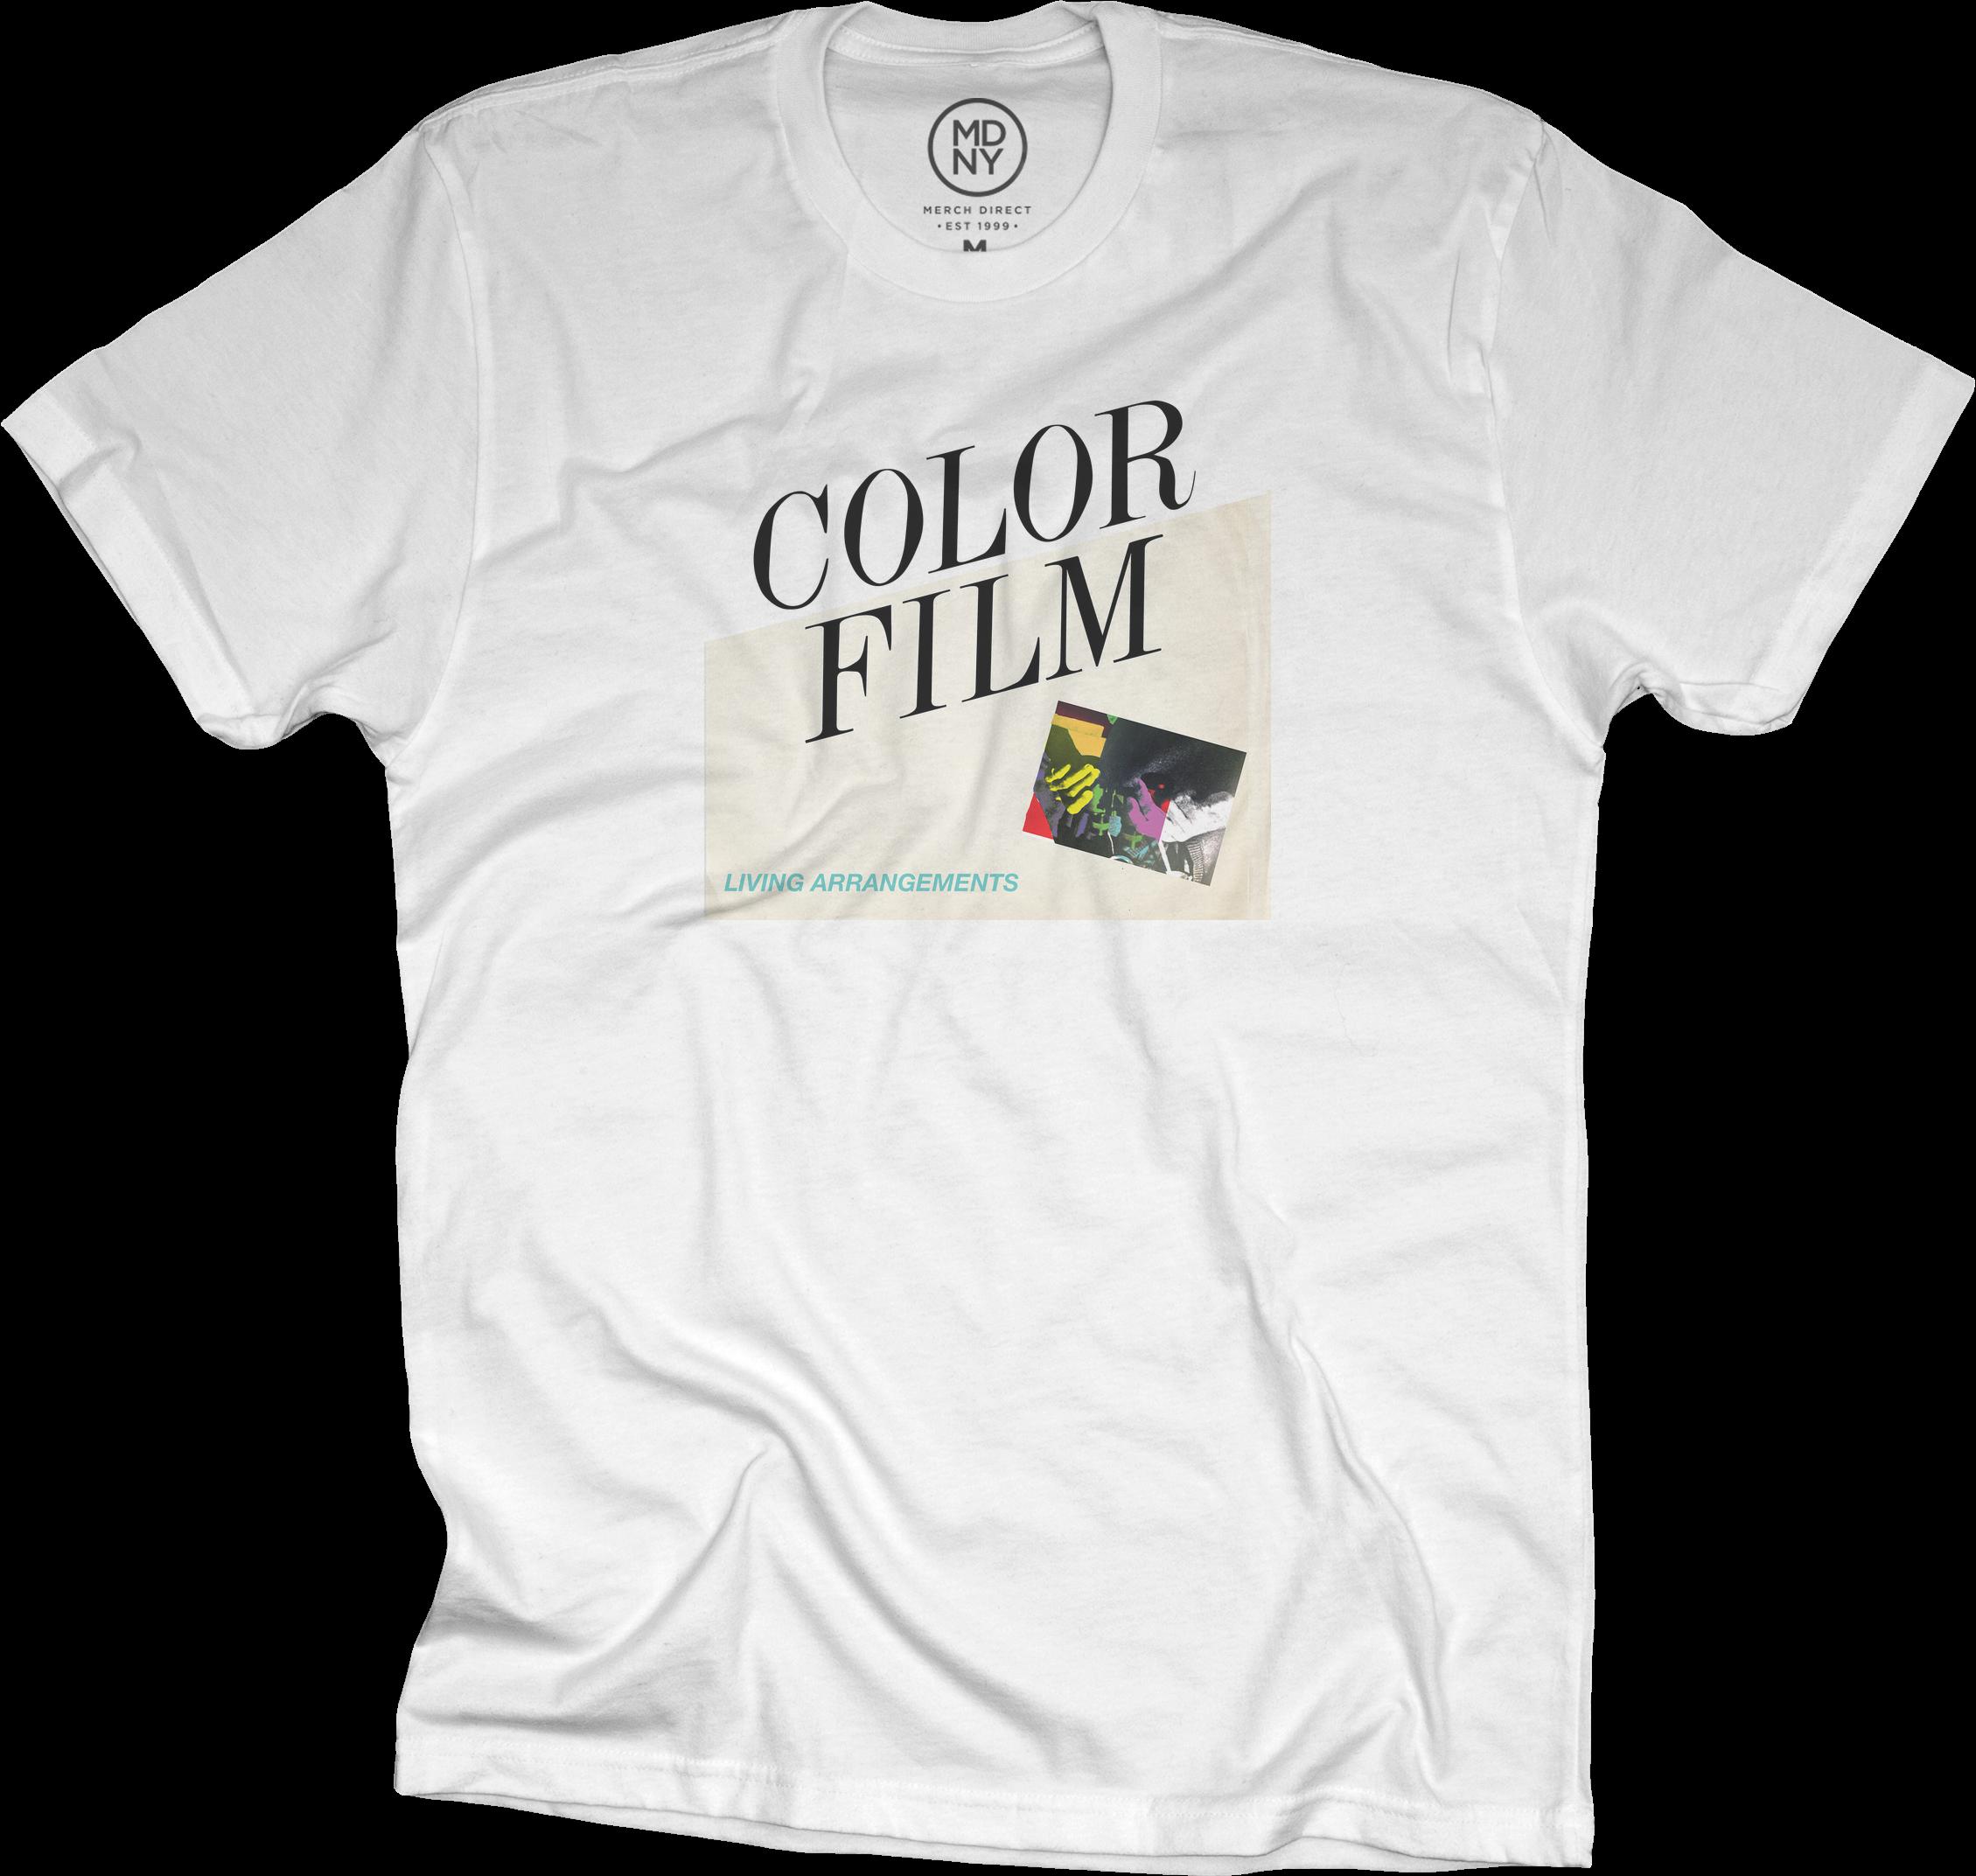 Living Arrangements Album Cover T-Shirt